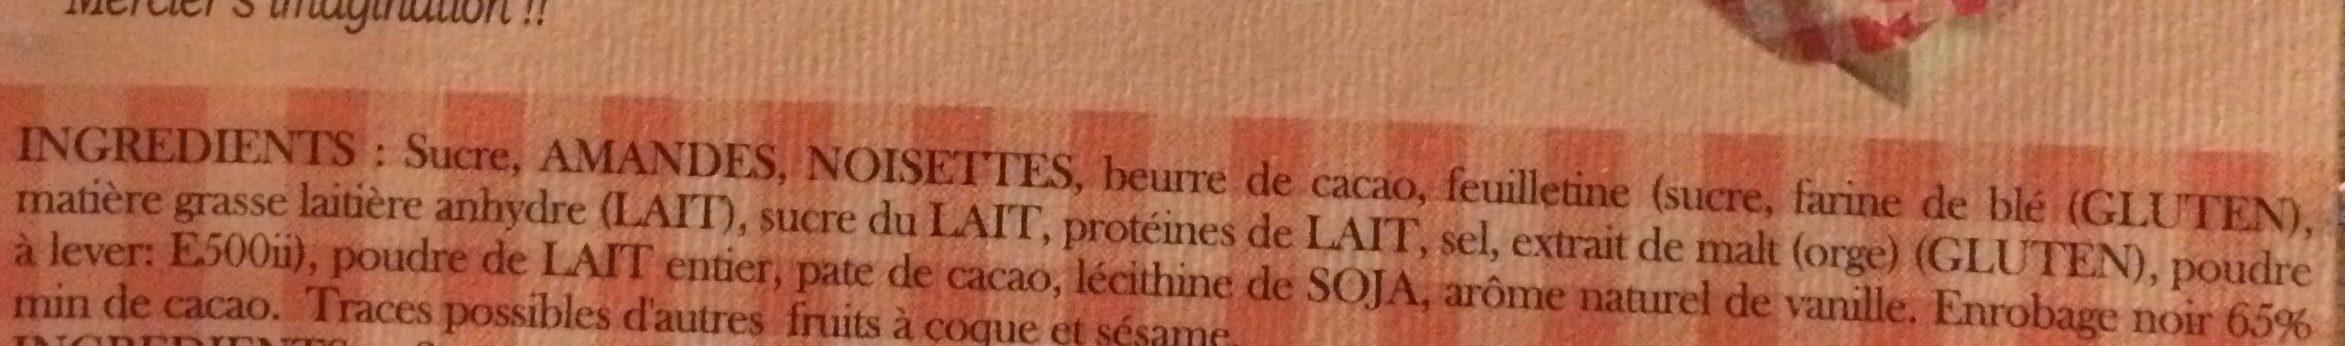 Bérichon: Camembert En Chocolat Gamme - Ingrédients